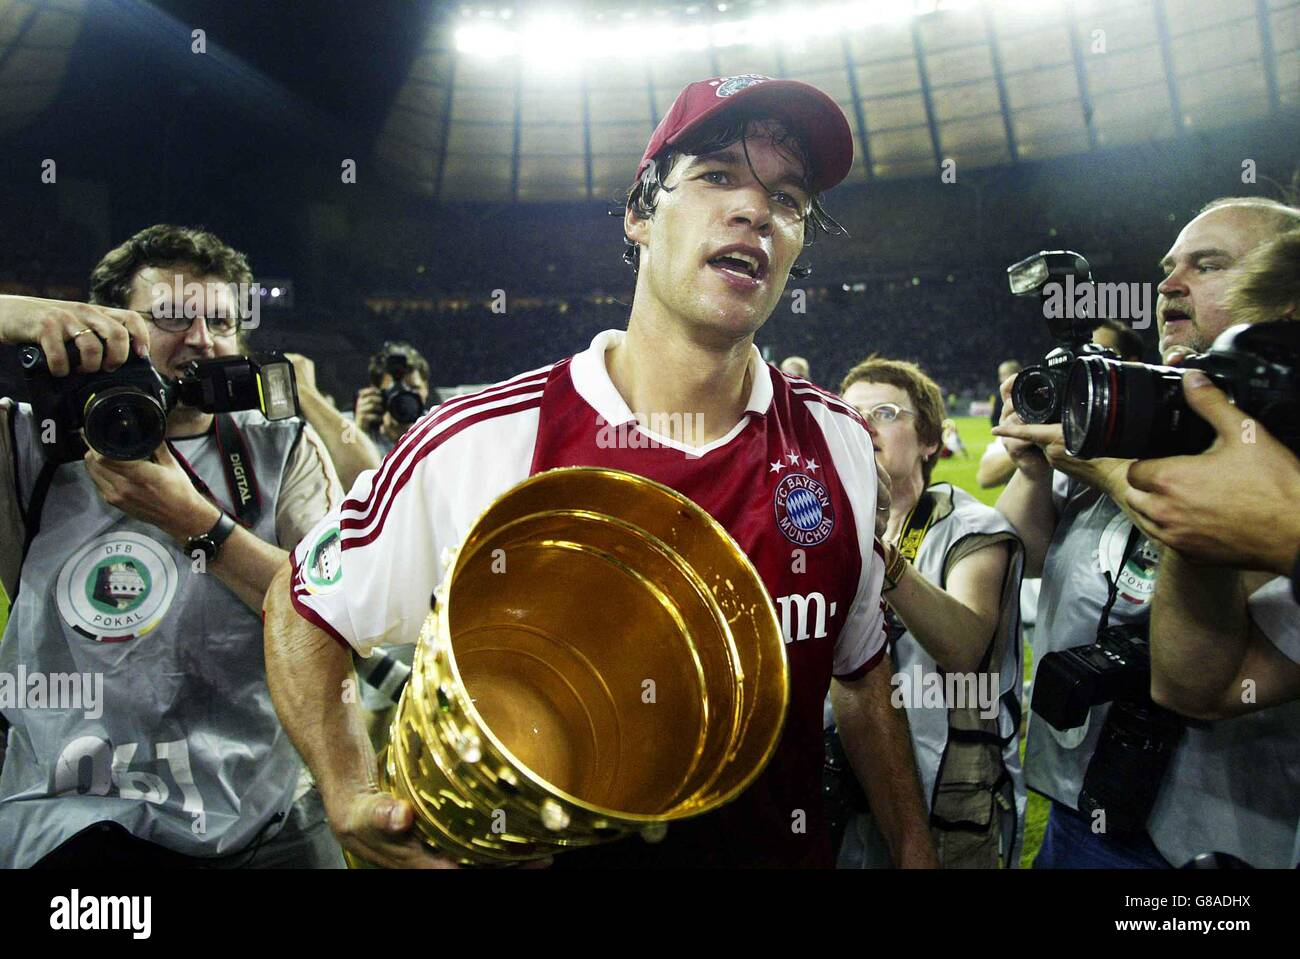 Soccer - DFB-Pokal, Finale - FC Bayern Muenchen  (FCB) - Schalke 04 Stock Photo